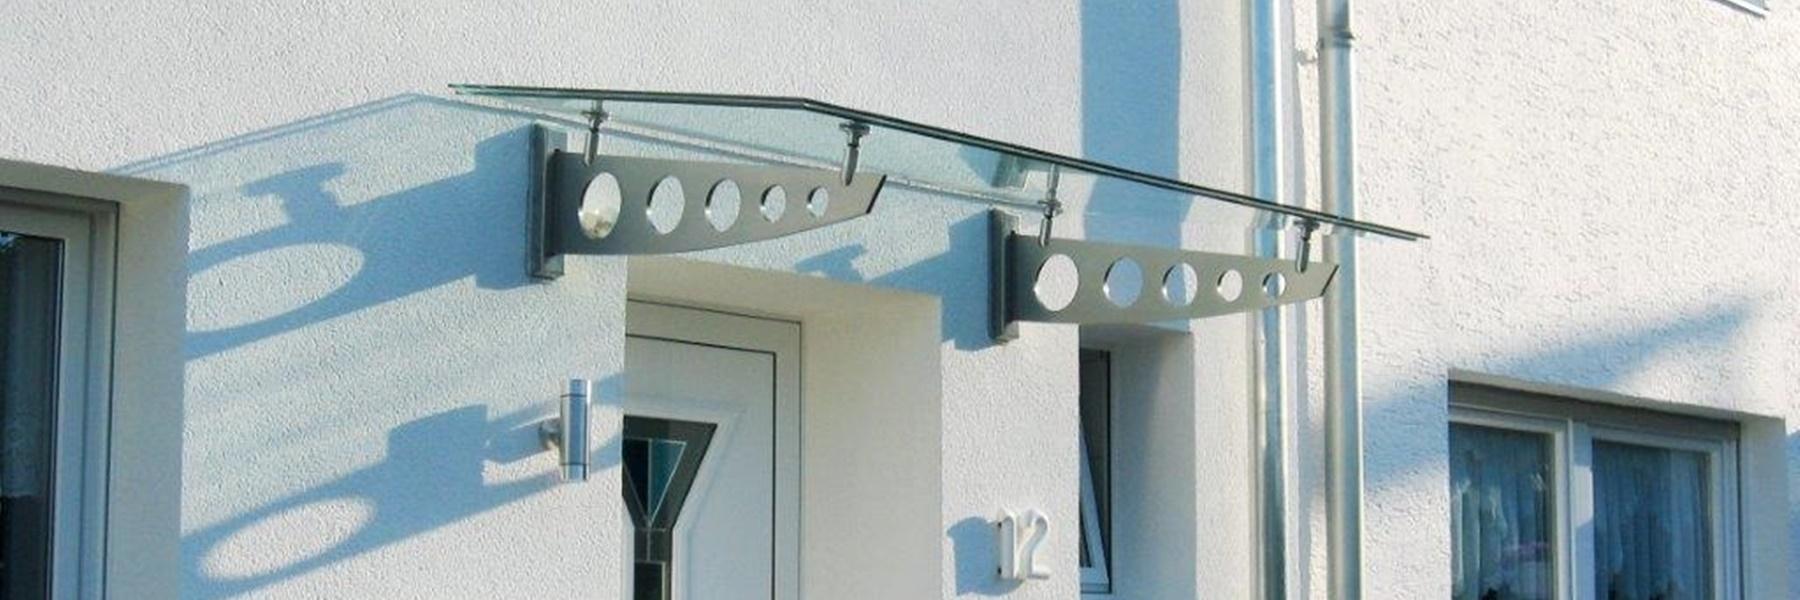 fantastisch ersatzbilderrahmen glas galerie bilderrahmen ideen. Black Bedroom Furniture Sets. Home Design Ideas